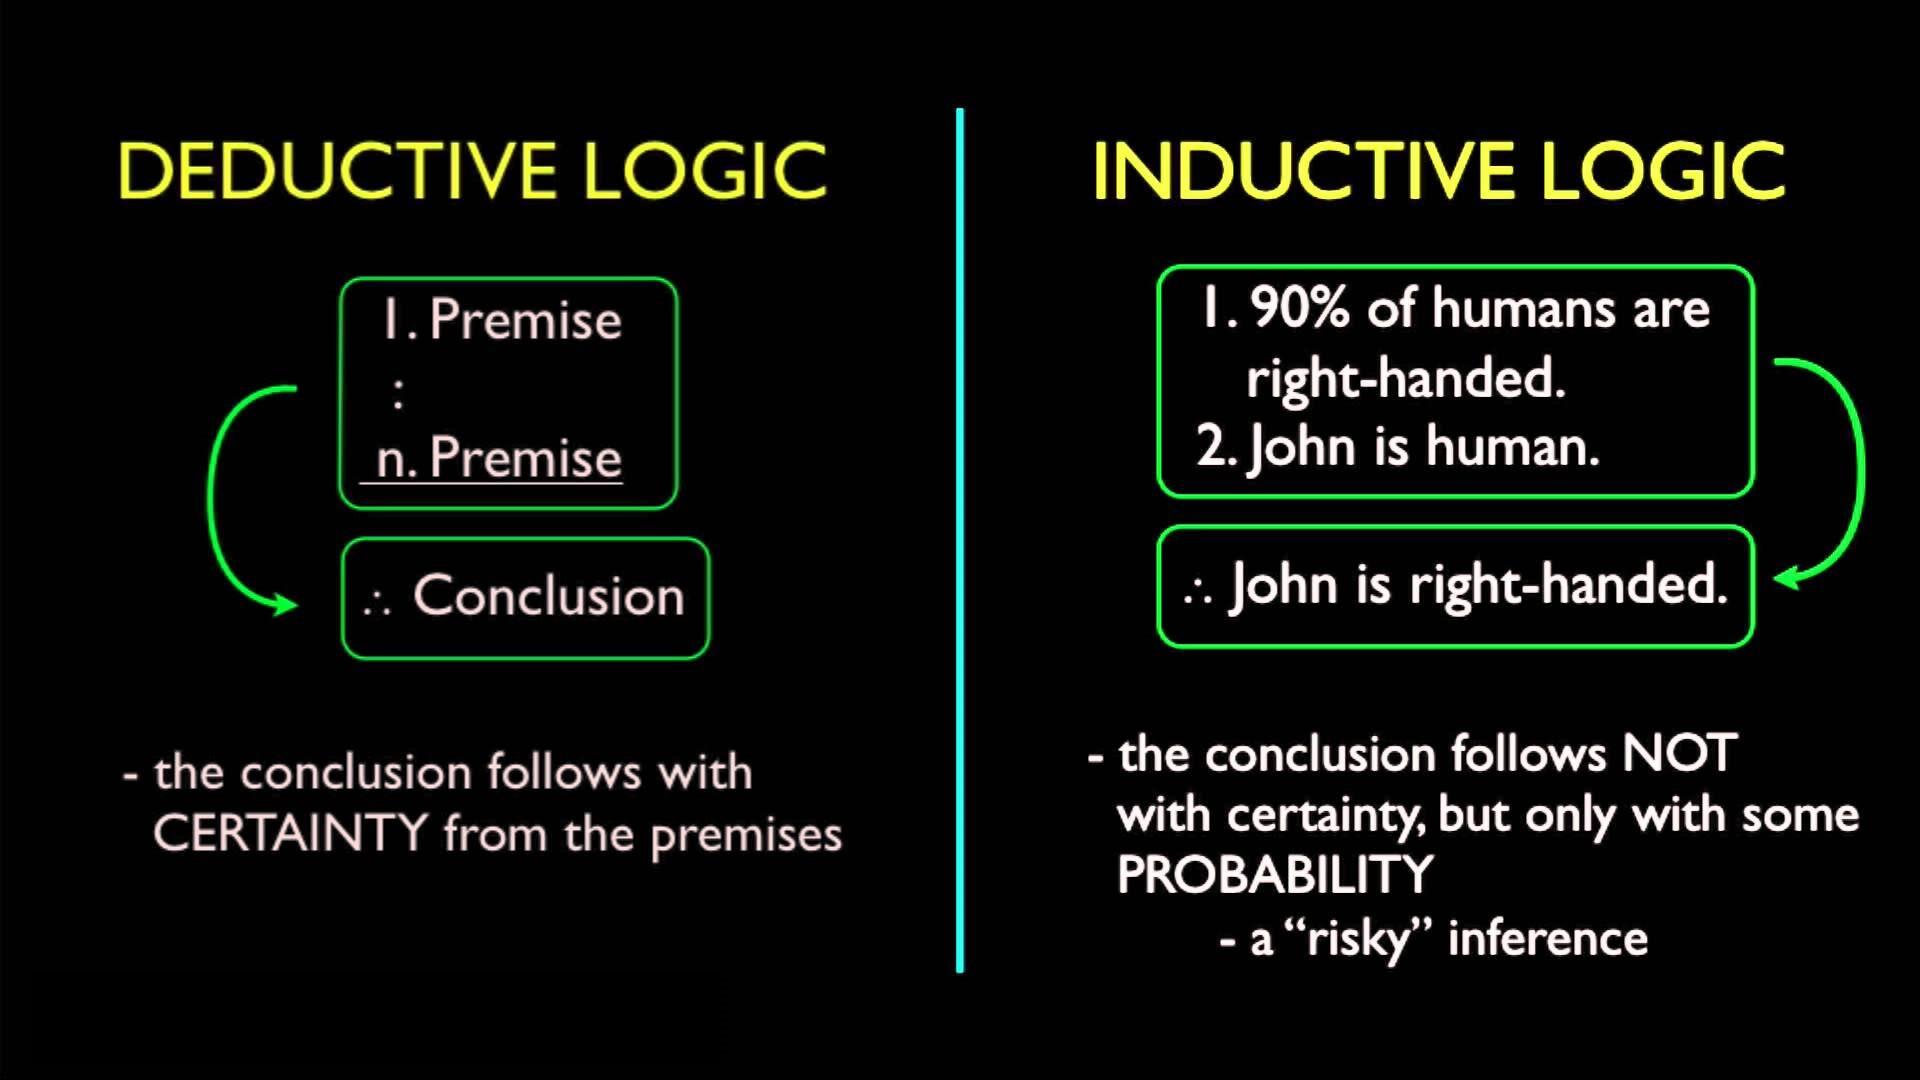 Inductive vs Deductive Logic